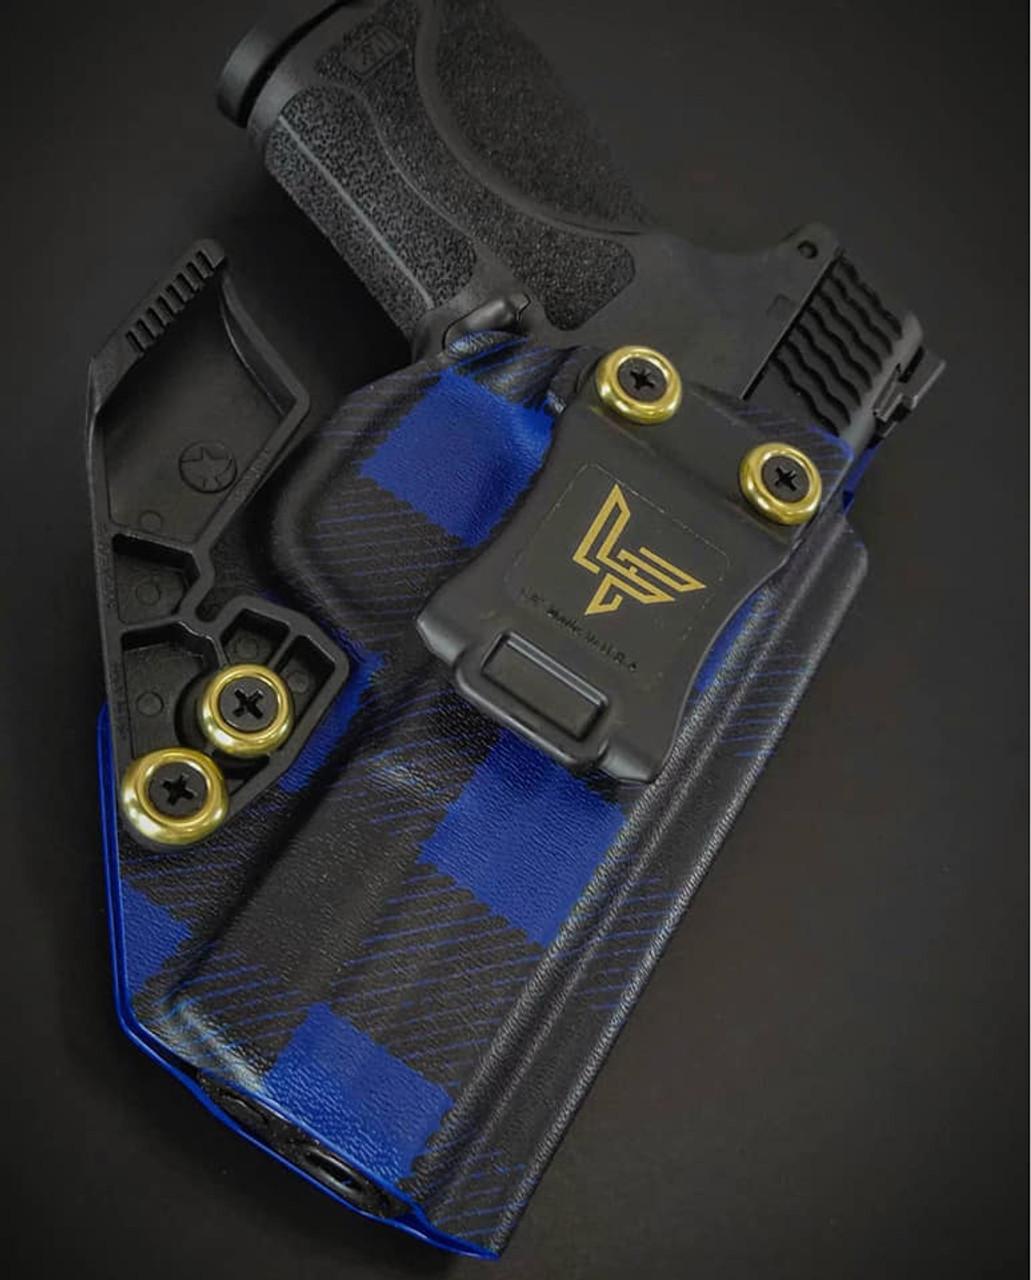 M&P Compact 2.0 Blue Flannel  Appendix Carry Kydex Holster